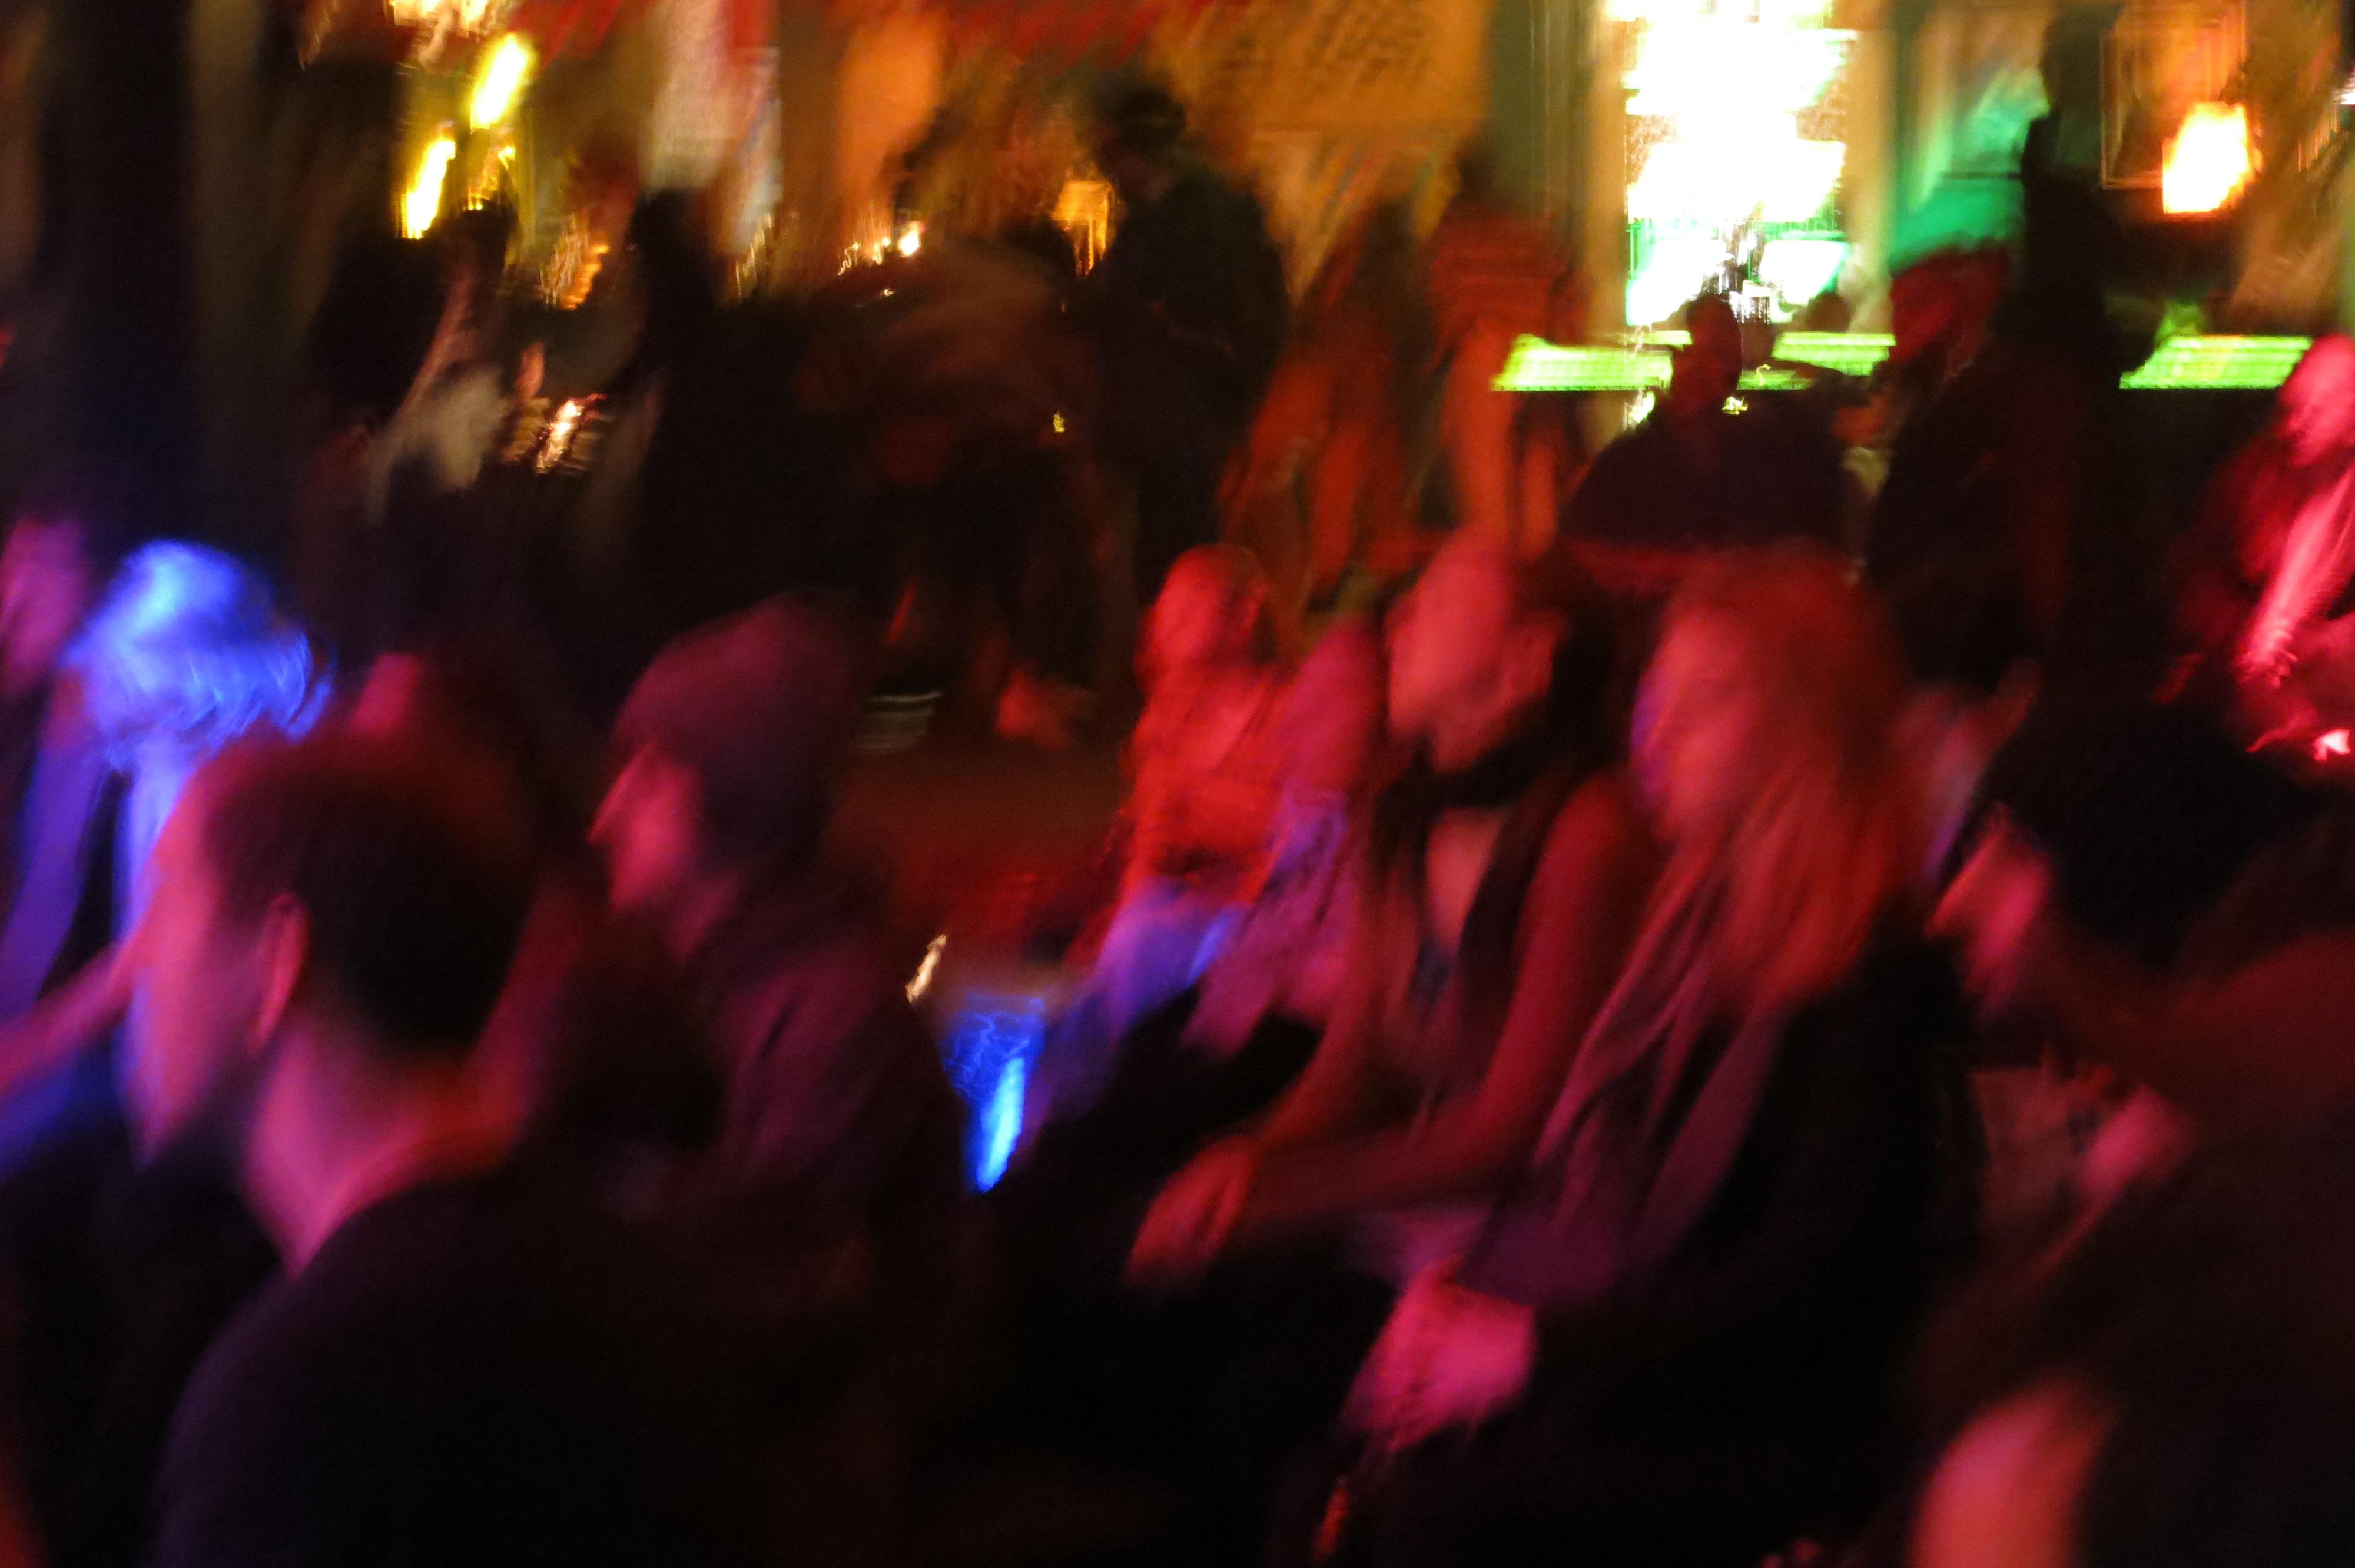 Ableton user group meeting: Live improvisation & performance